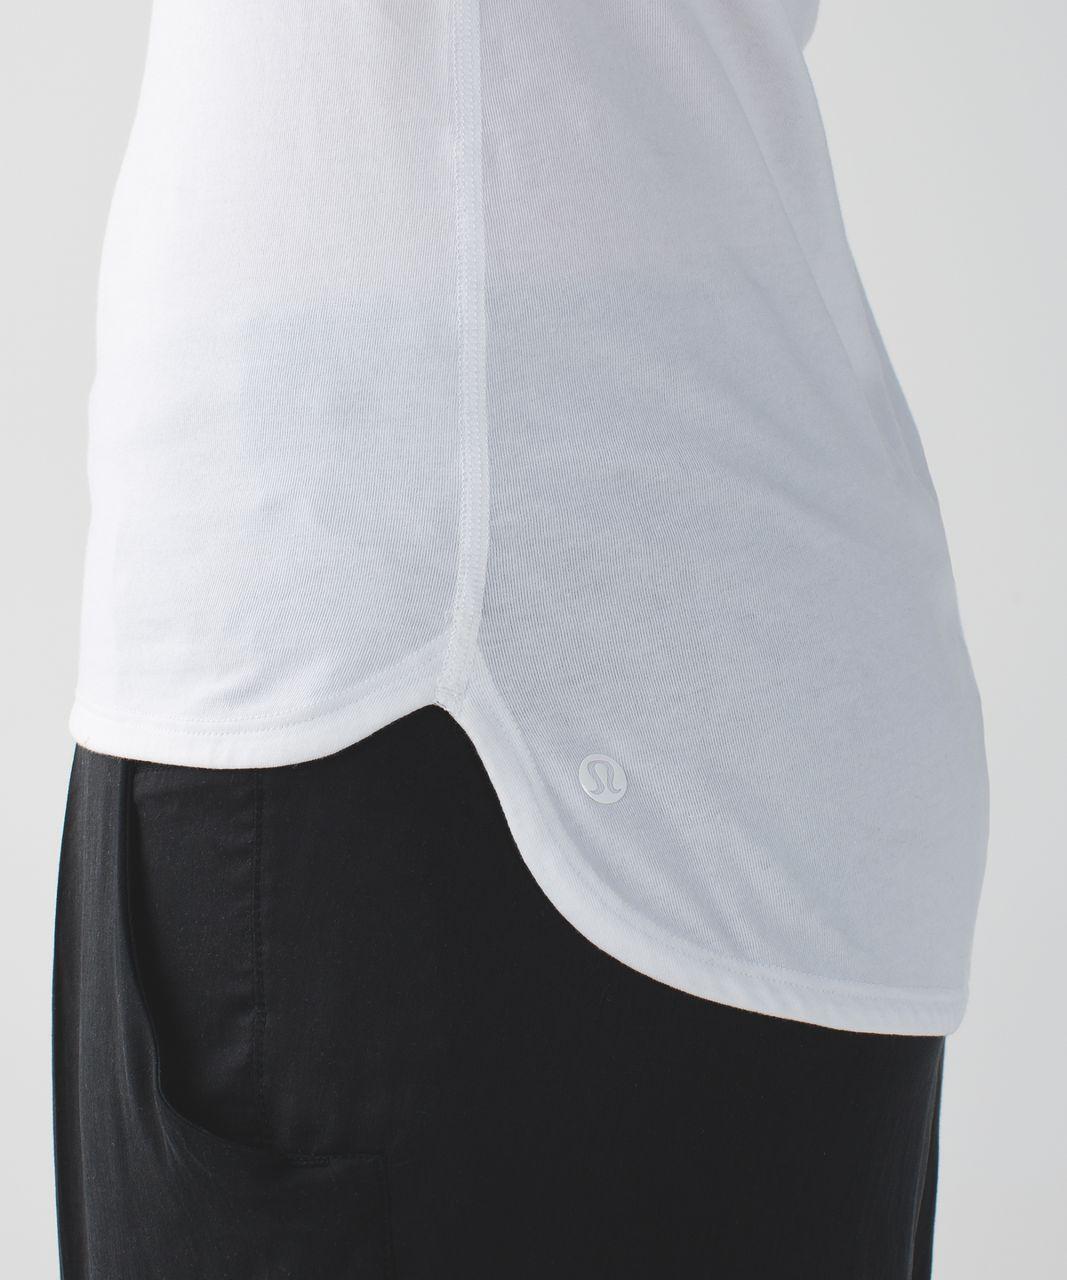 Lululemon Circadian Long Sleeve V Neck Tee - White